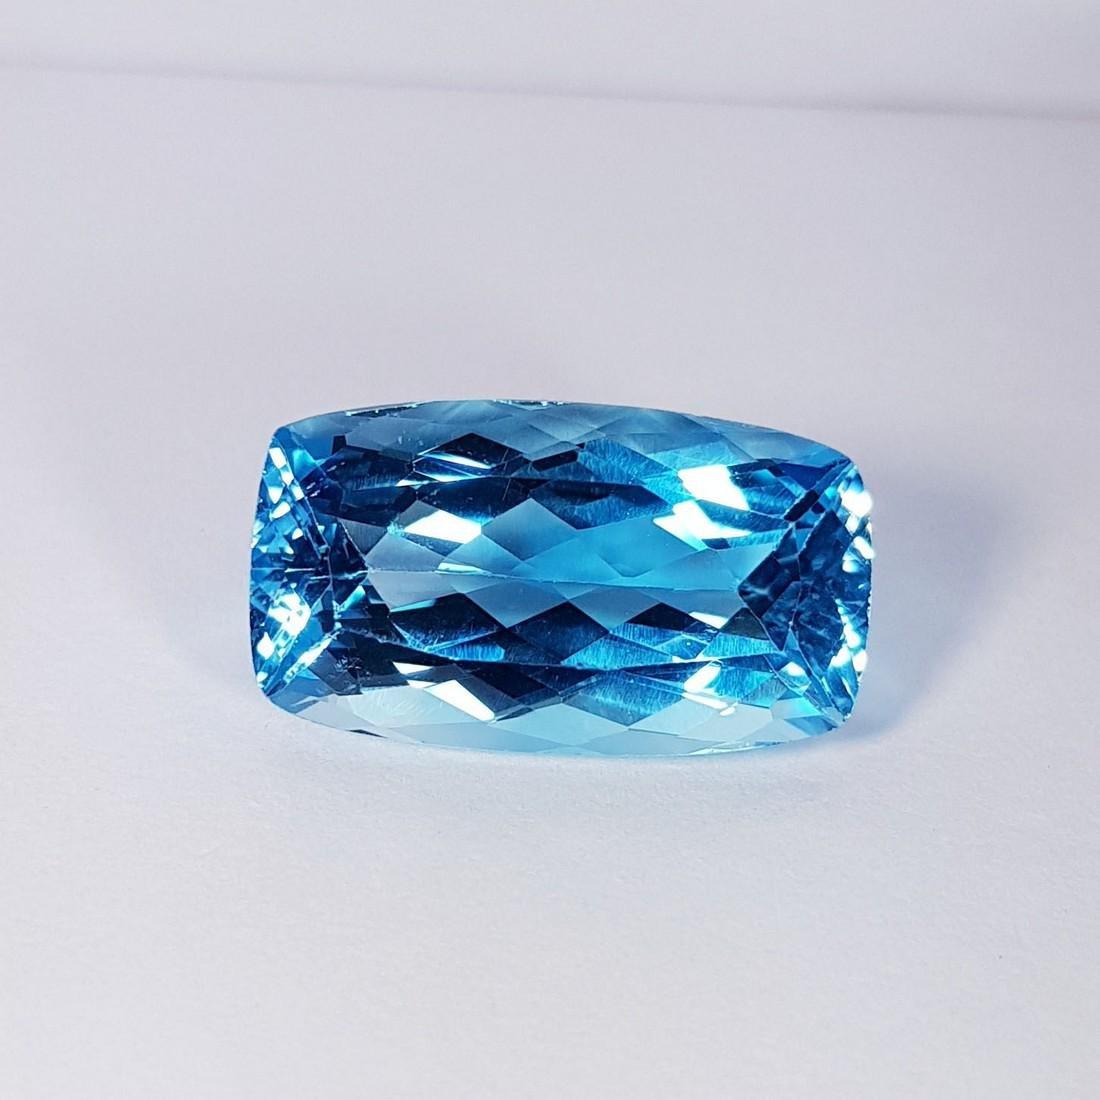 Natural Swiss Blue Topaz - 24.25 ct - 2